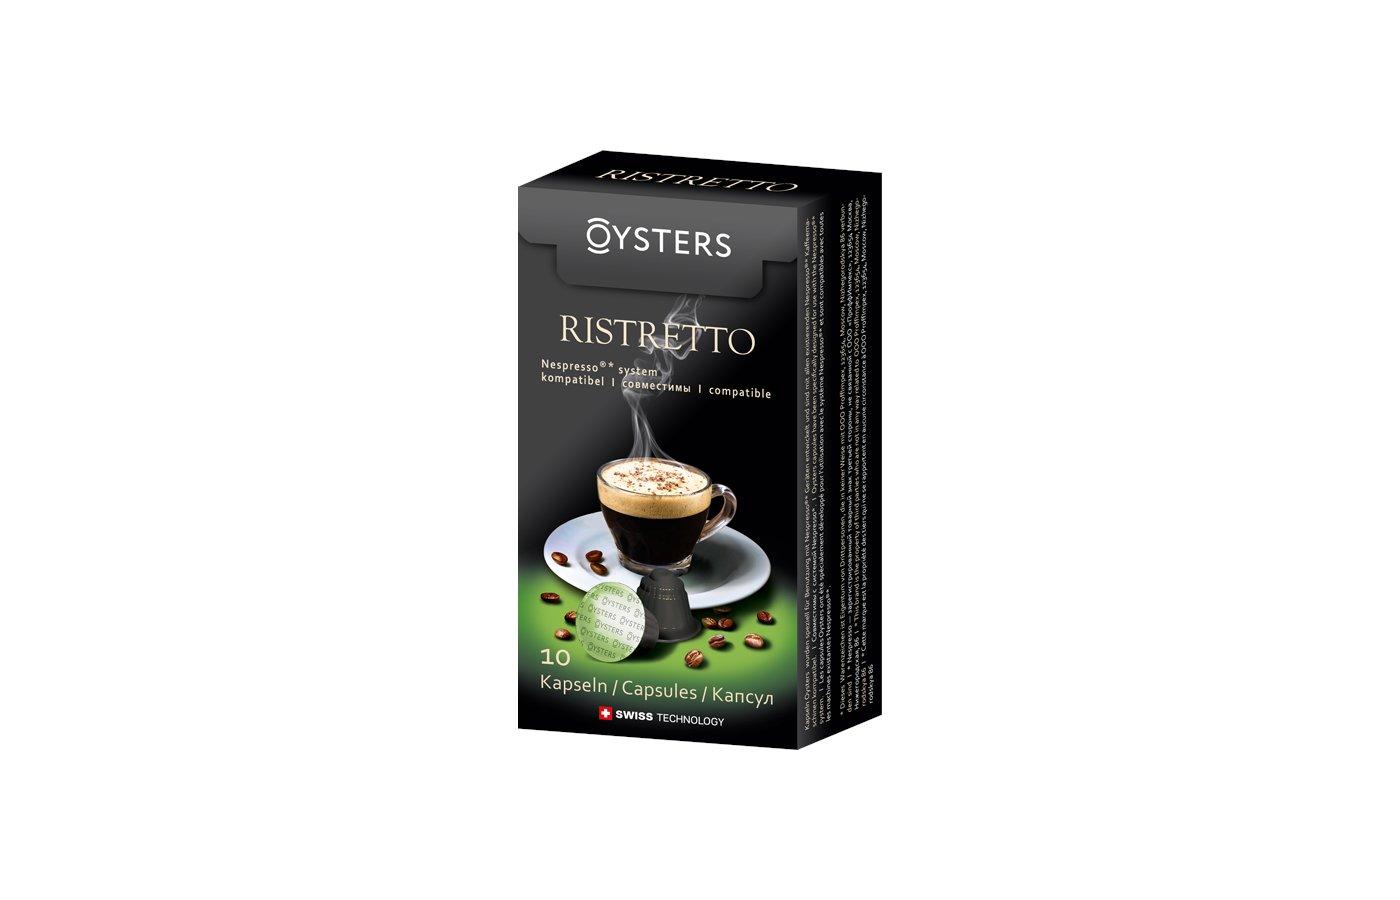 капсулы для кофеварок Oysters Ristretto 10 капсул